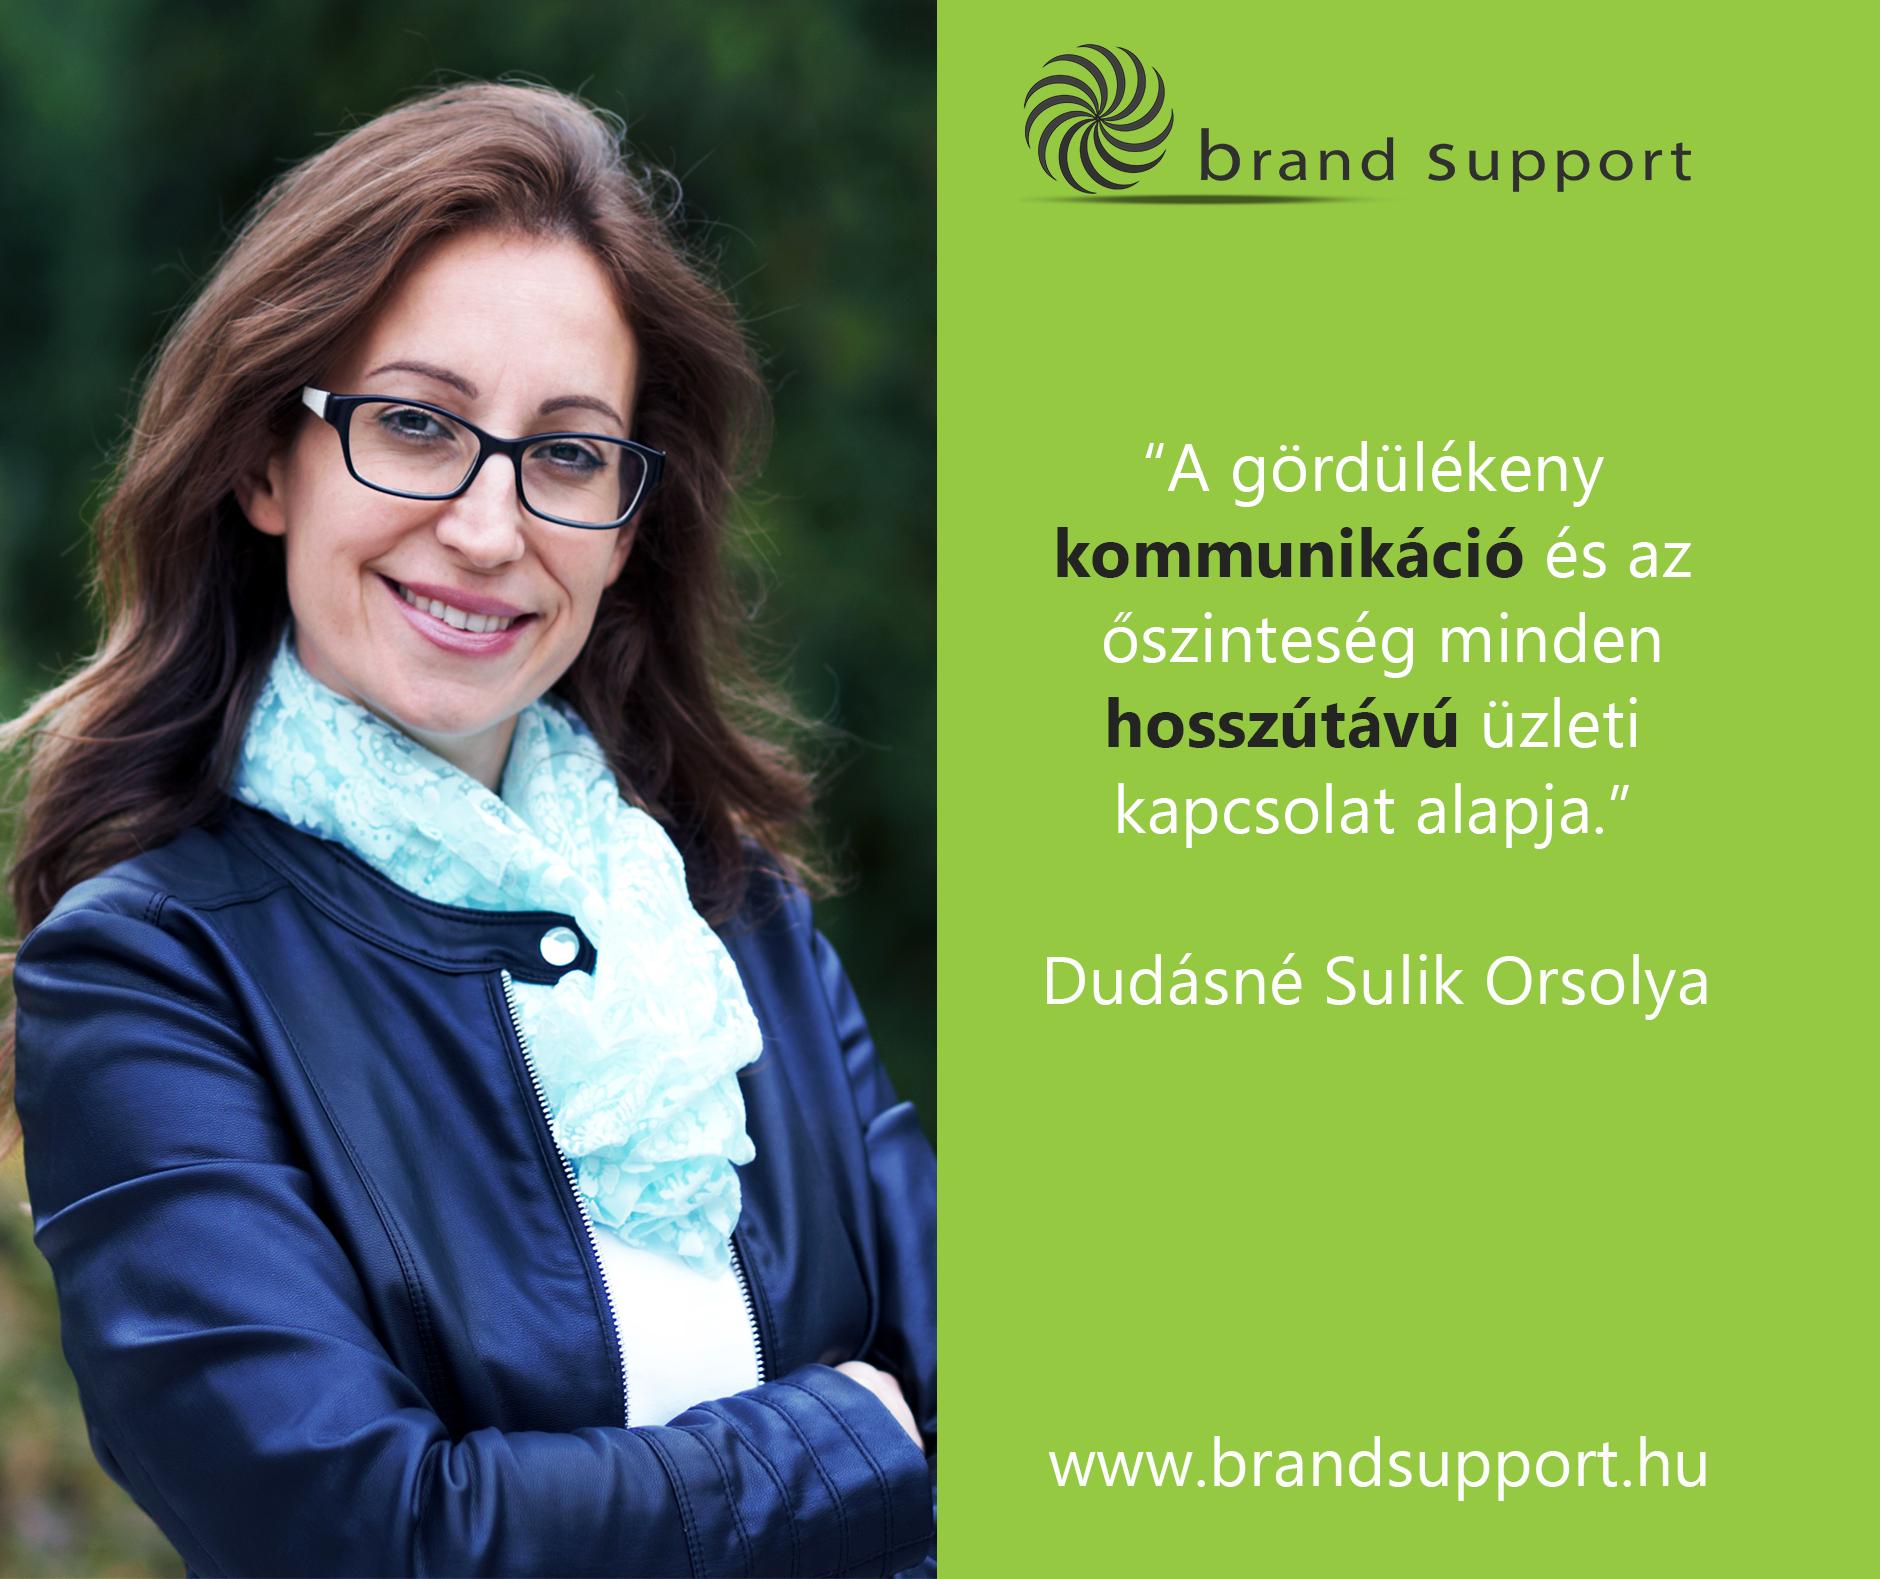 dudasne_sulik_orsolya.png